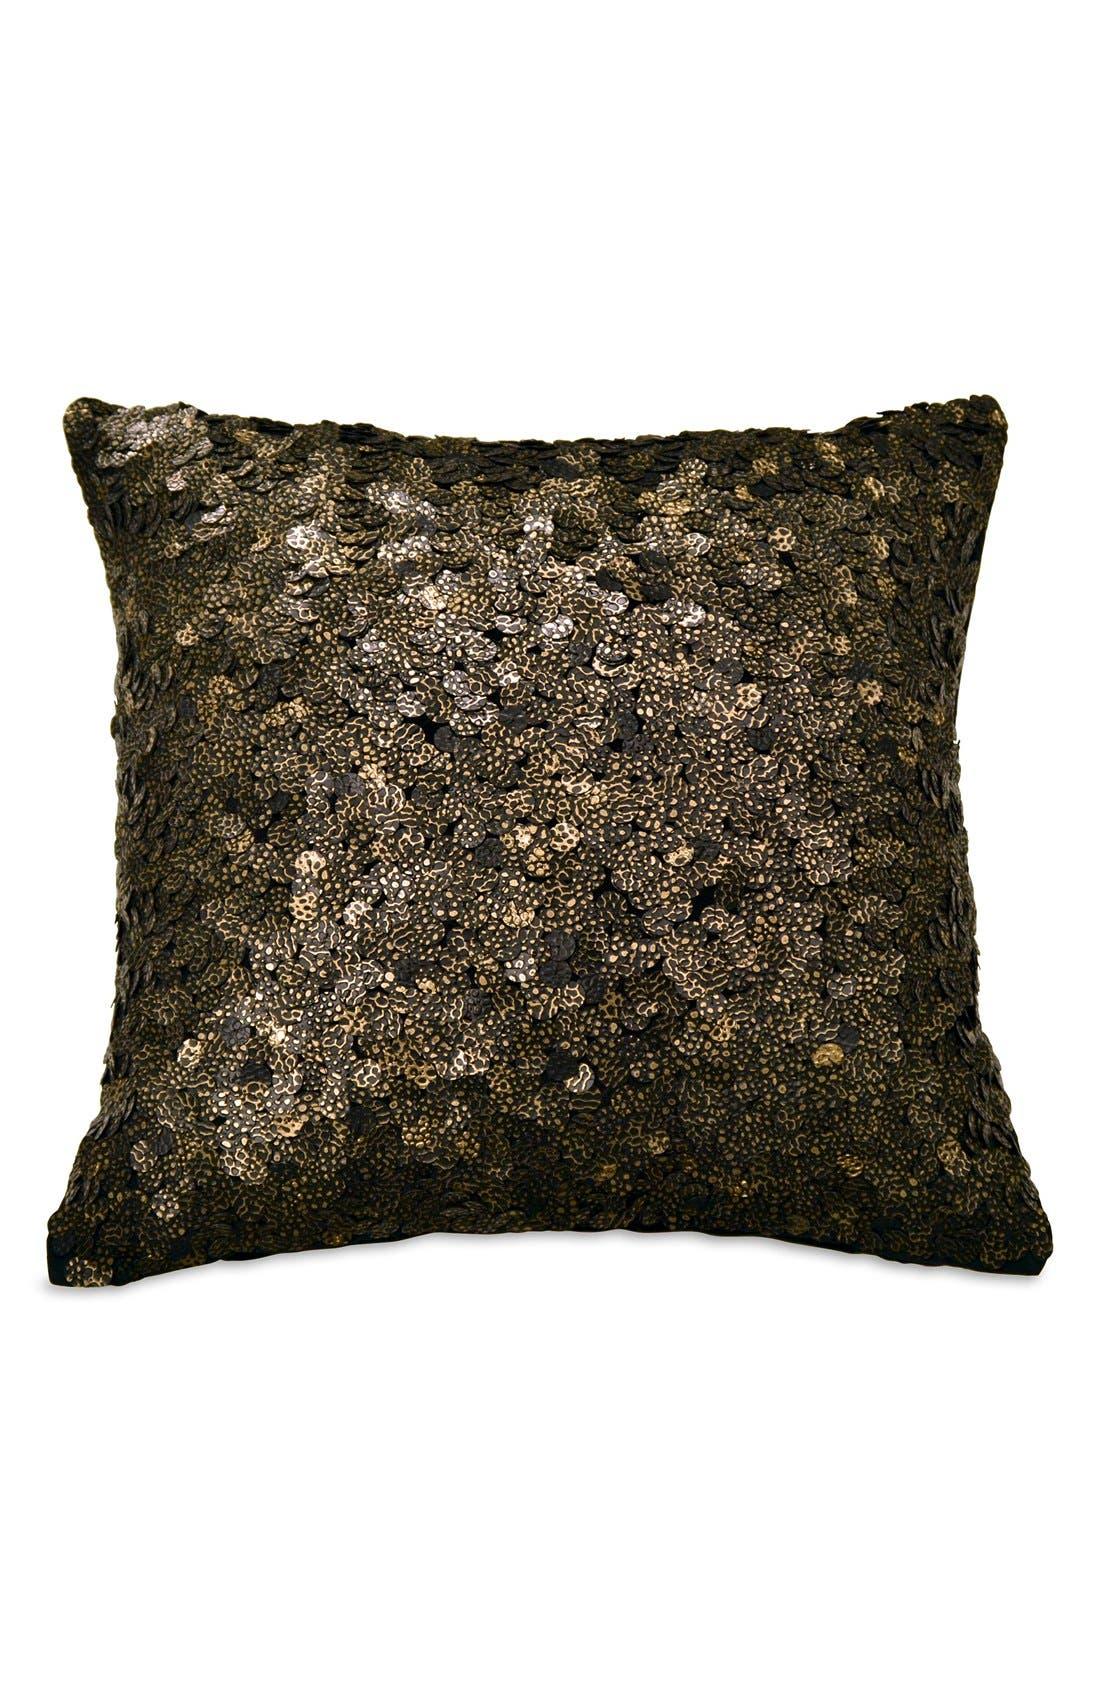 Donna Karan Collection Sequin Pillow,                             Main thumbnail 1, color,                             001